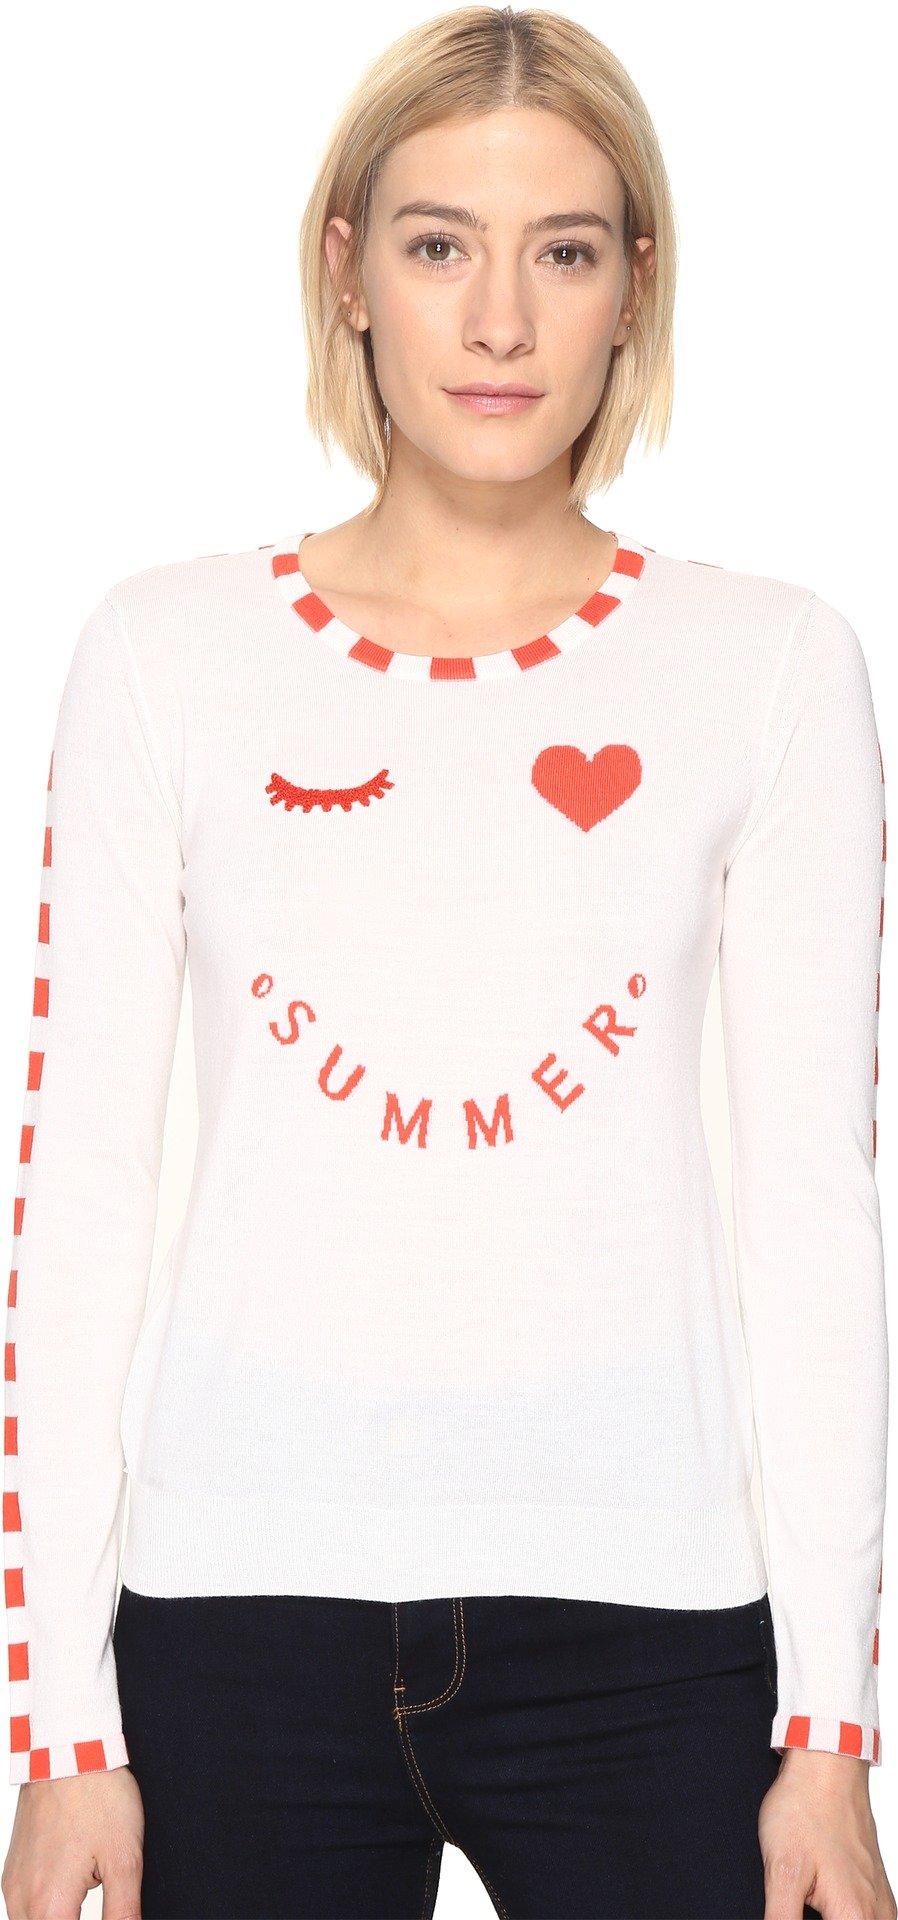 Paul Smith Women's Summer Sweater White Sweater